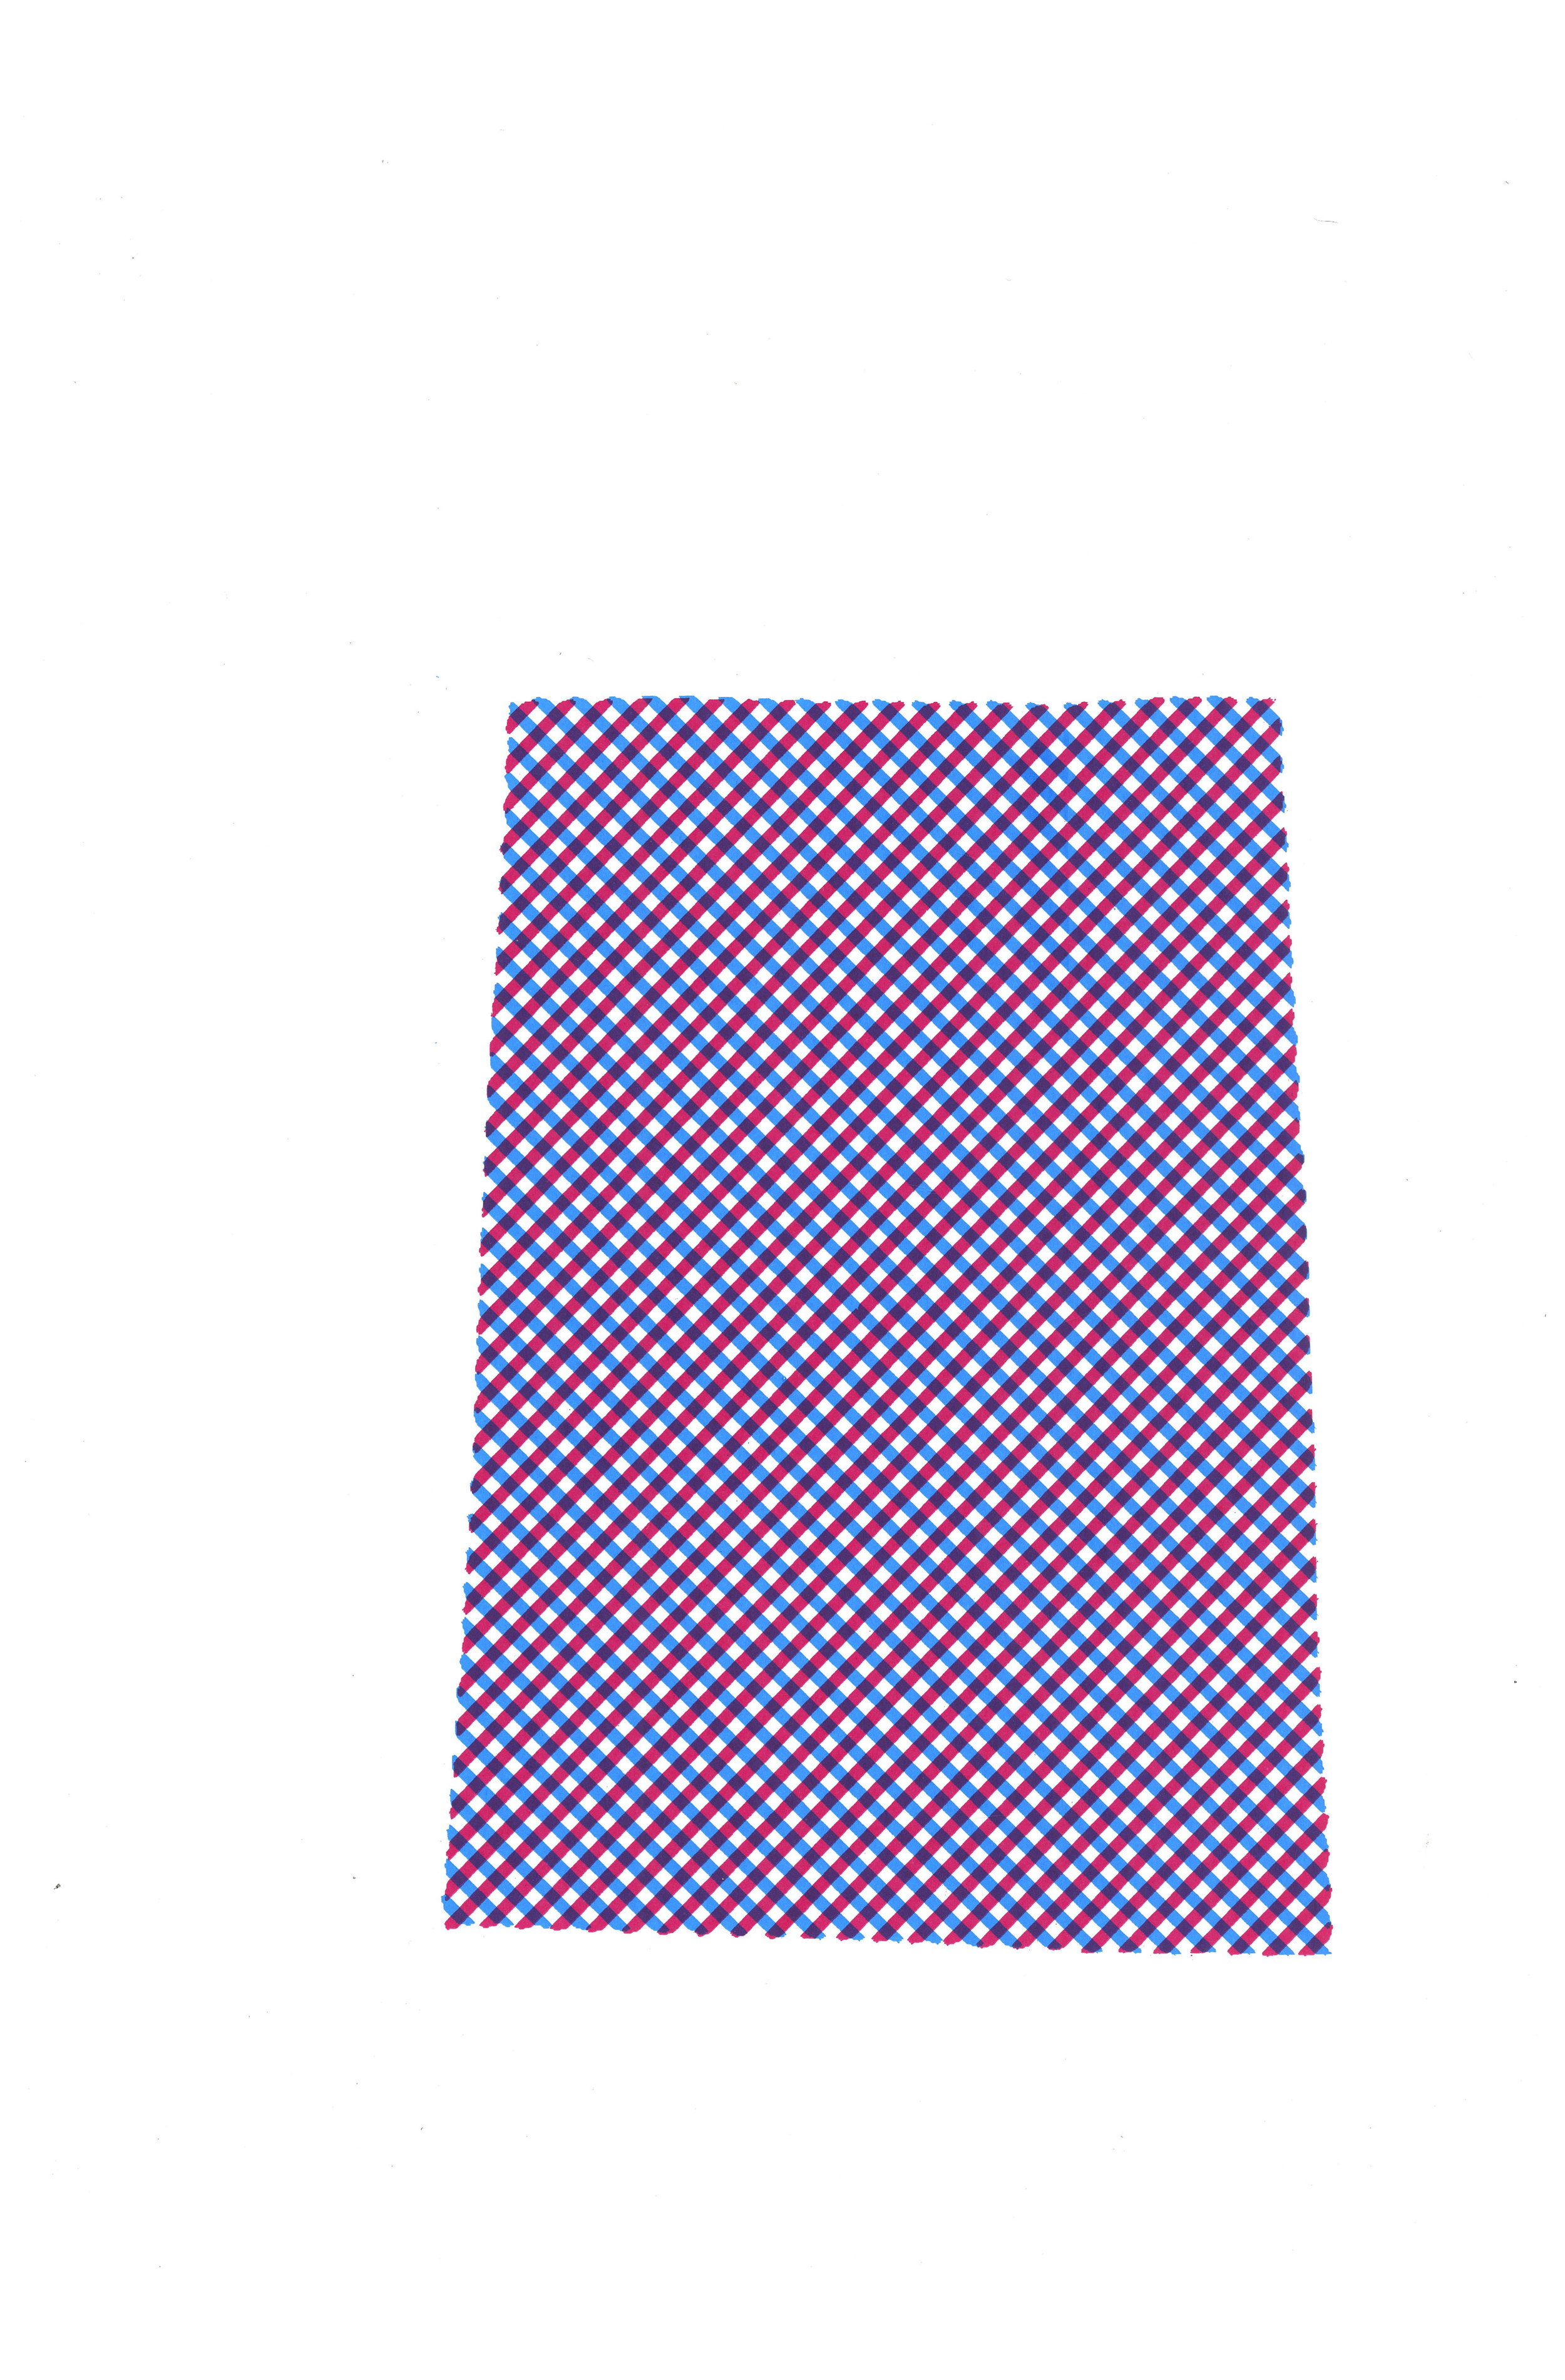 Trapezoid_cm_72.jpg